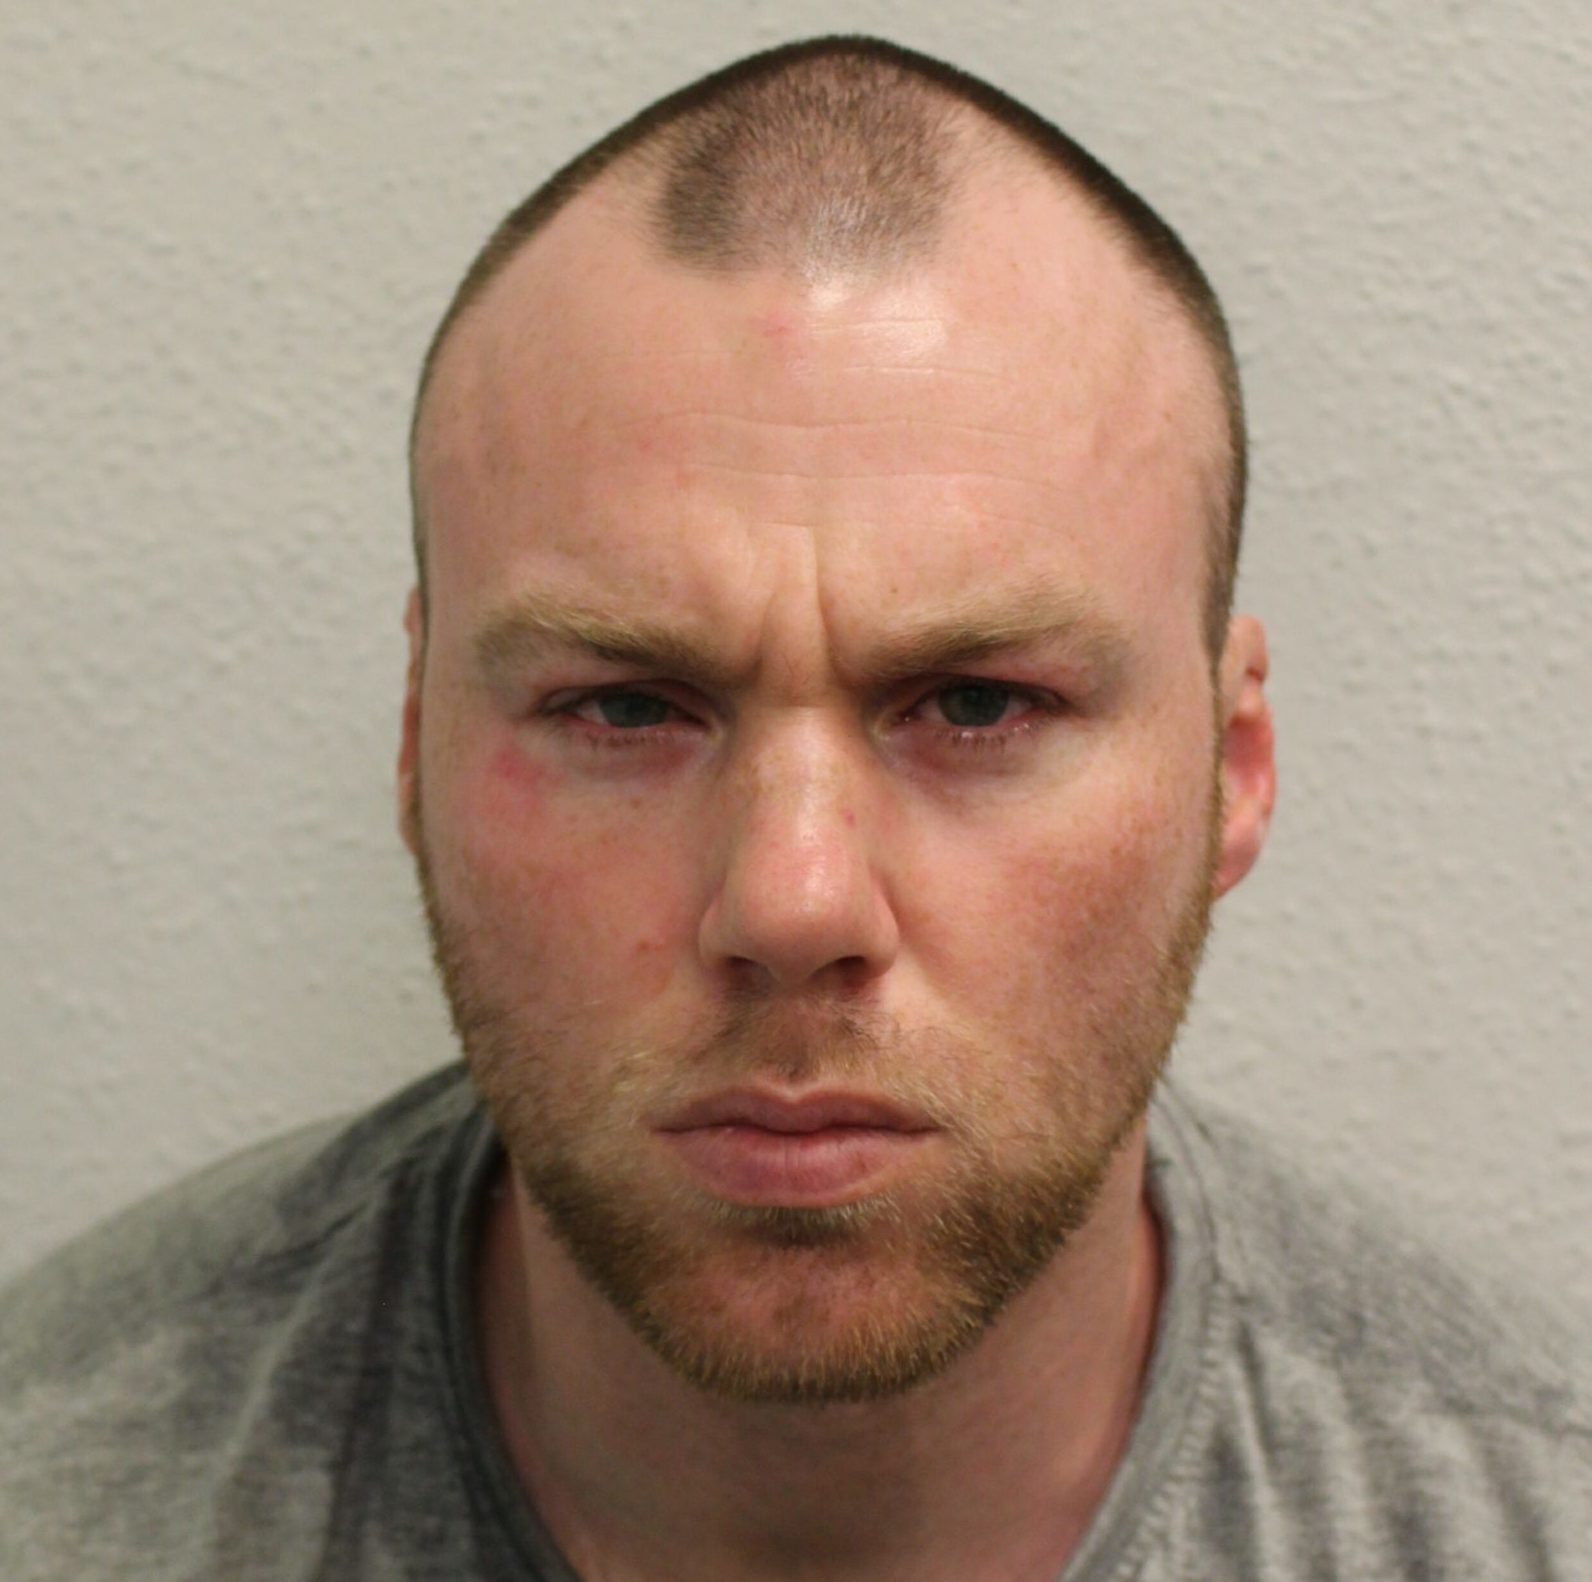 Dick Pic Killer Gets 18 Years Behind Bars